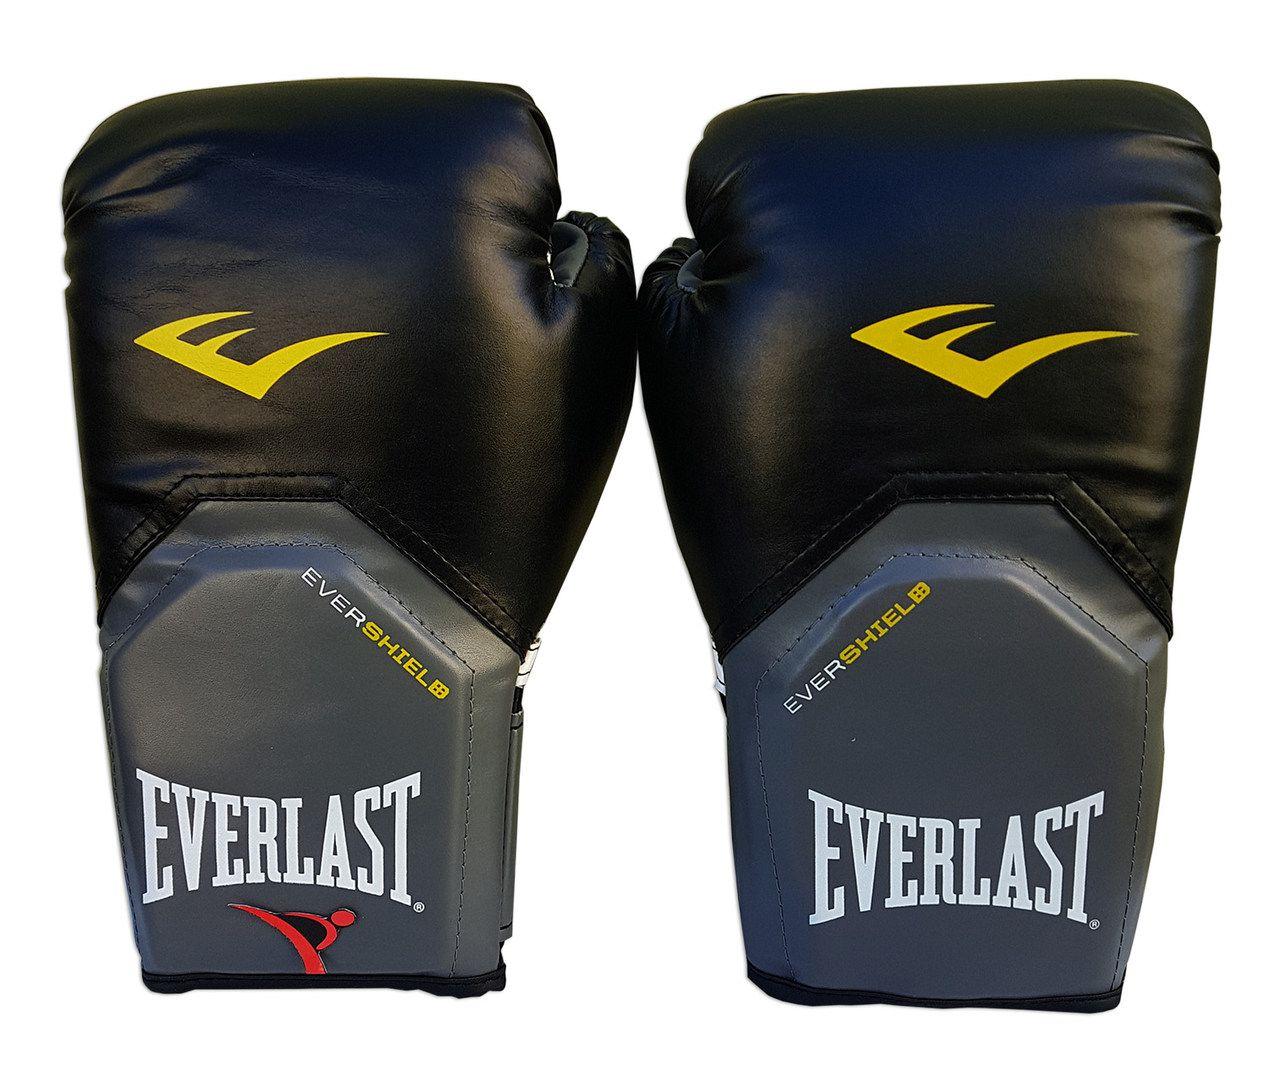 Luva de Boxe / Muay Thai 12oz - Preto - Pro Style - Everlast  - PRALUTA SHOP